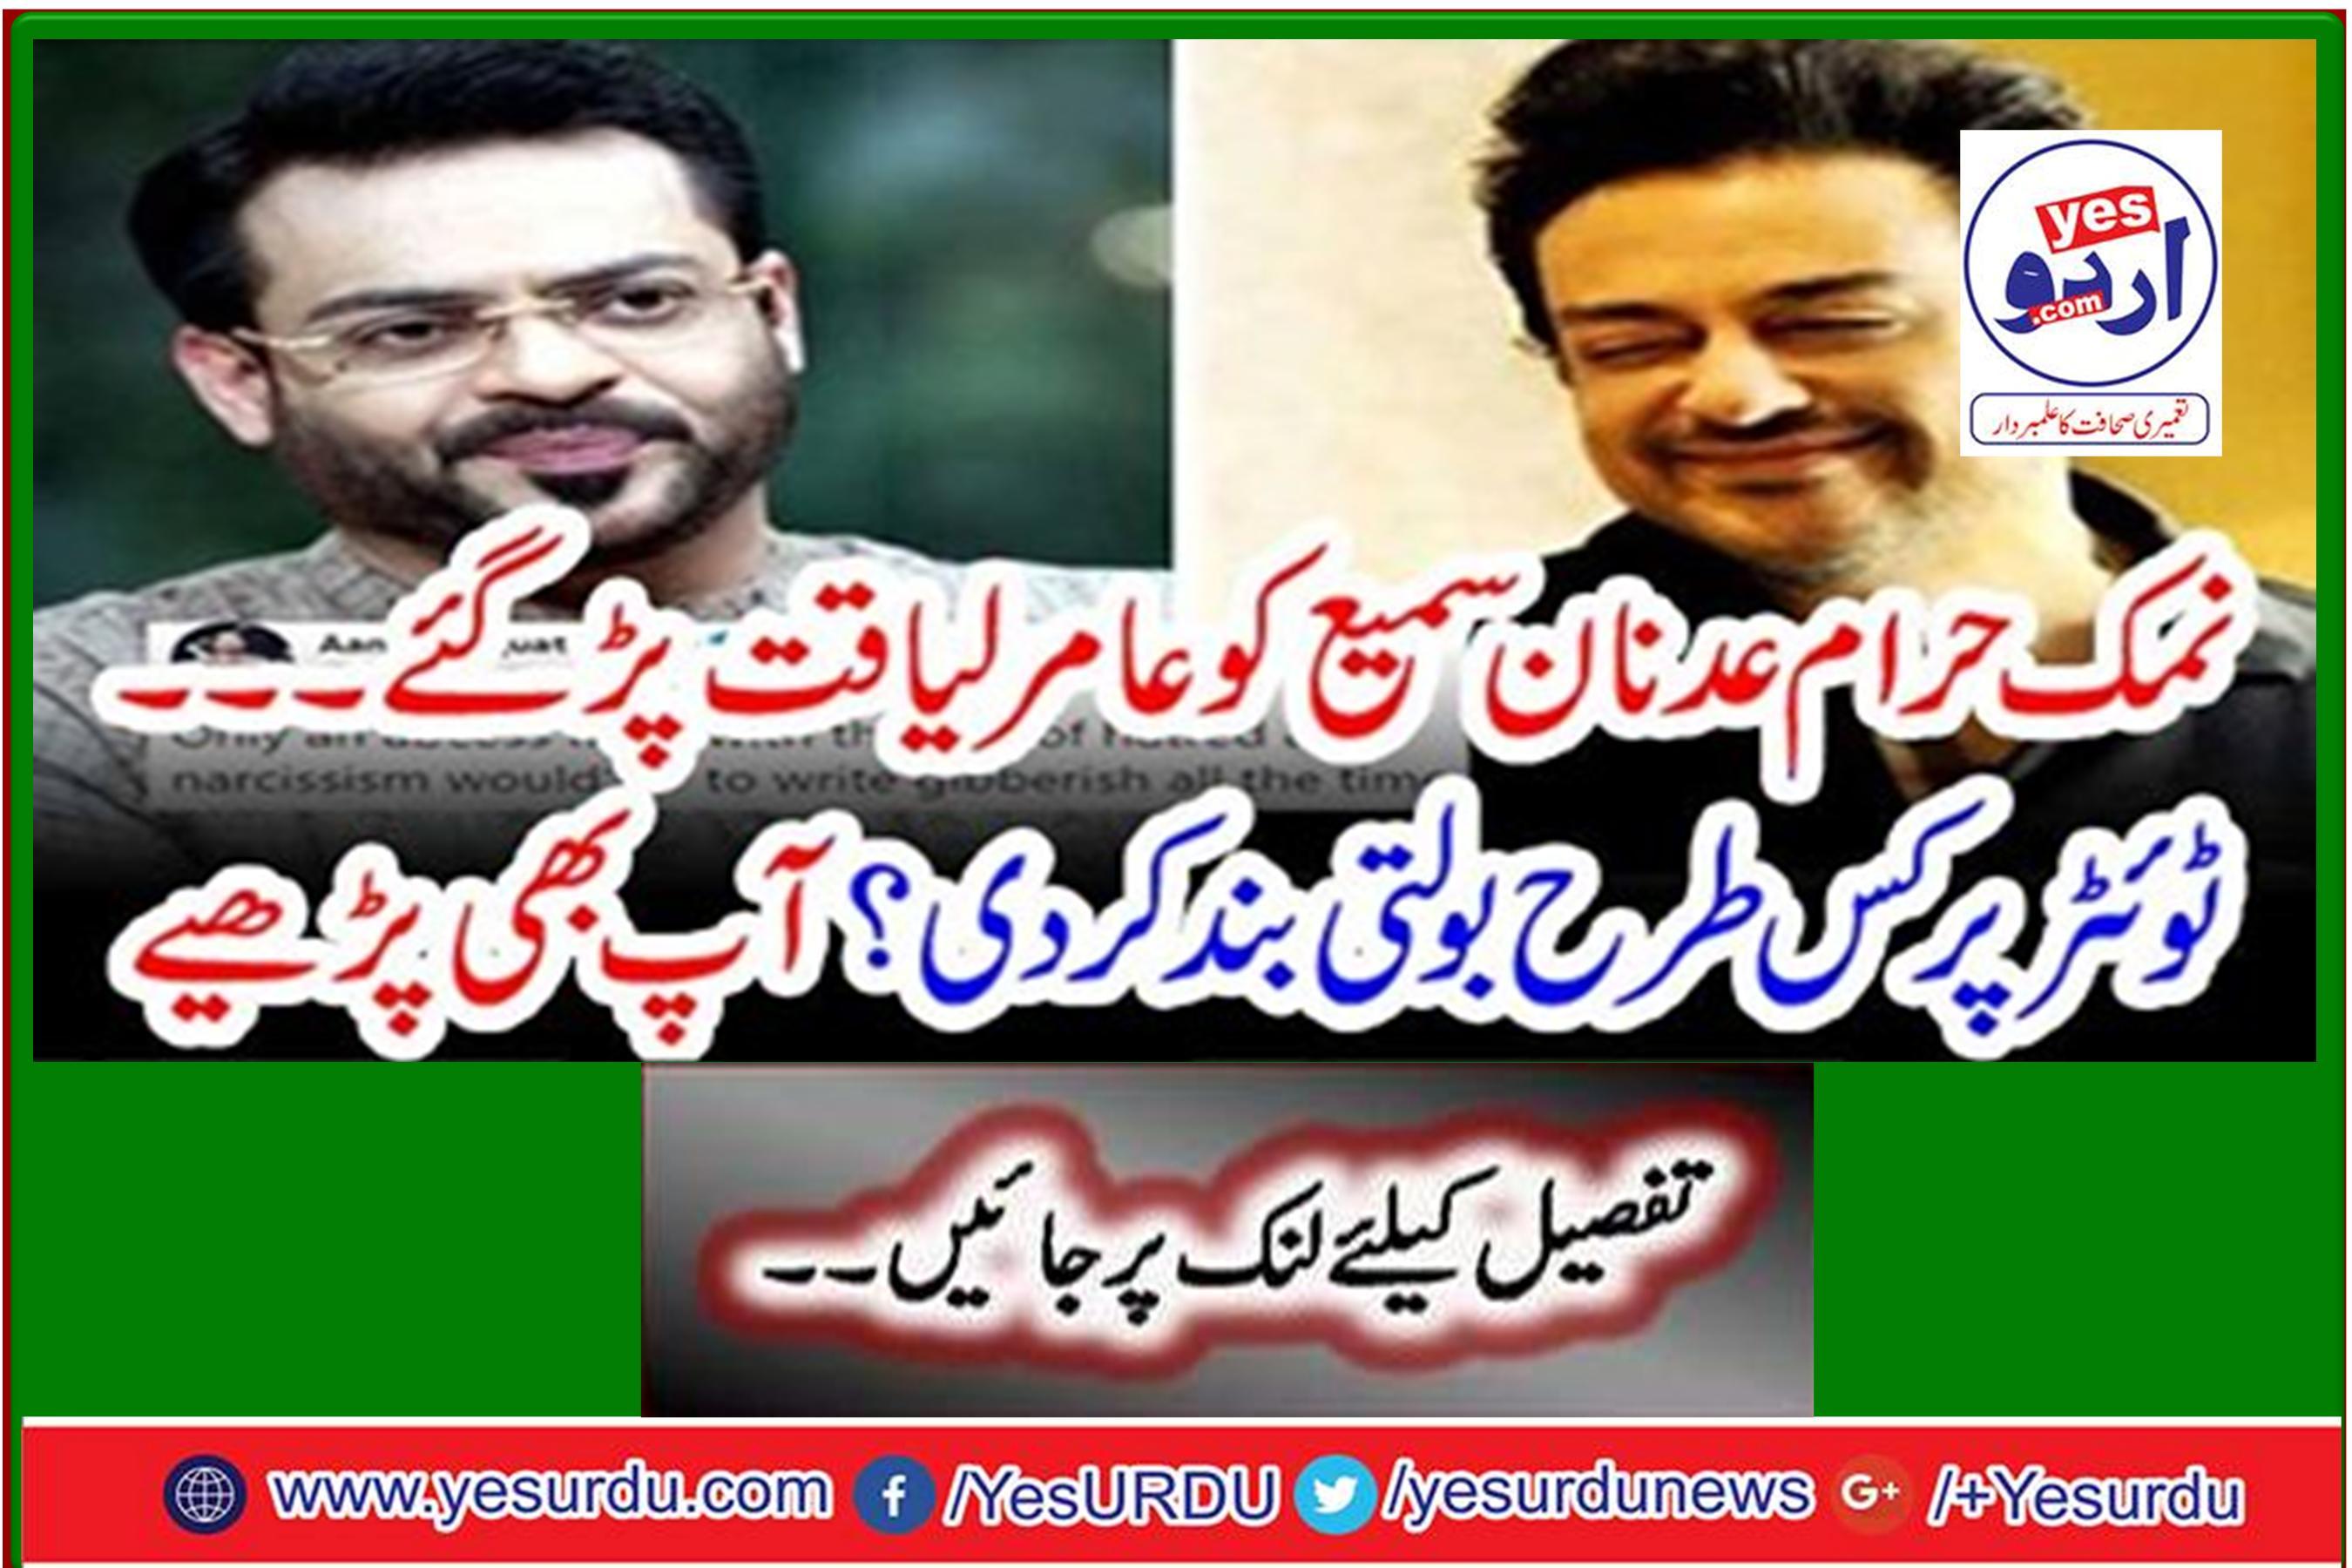 Salt Haram Adnan Sami got Amir Liaquat ... How did you stop speaking on Twitter? You also read